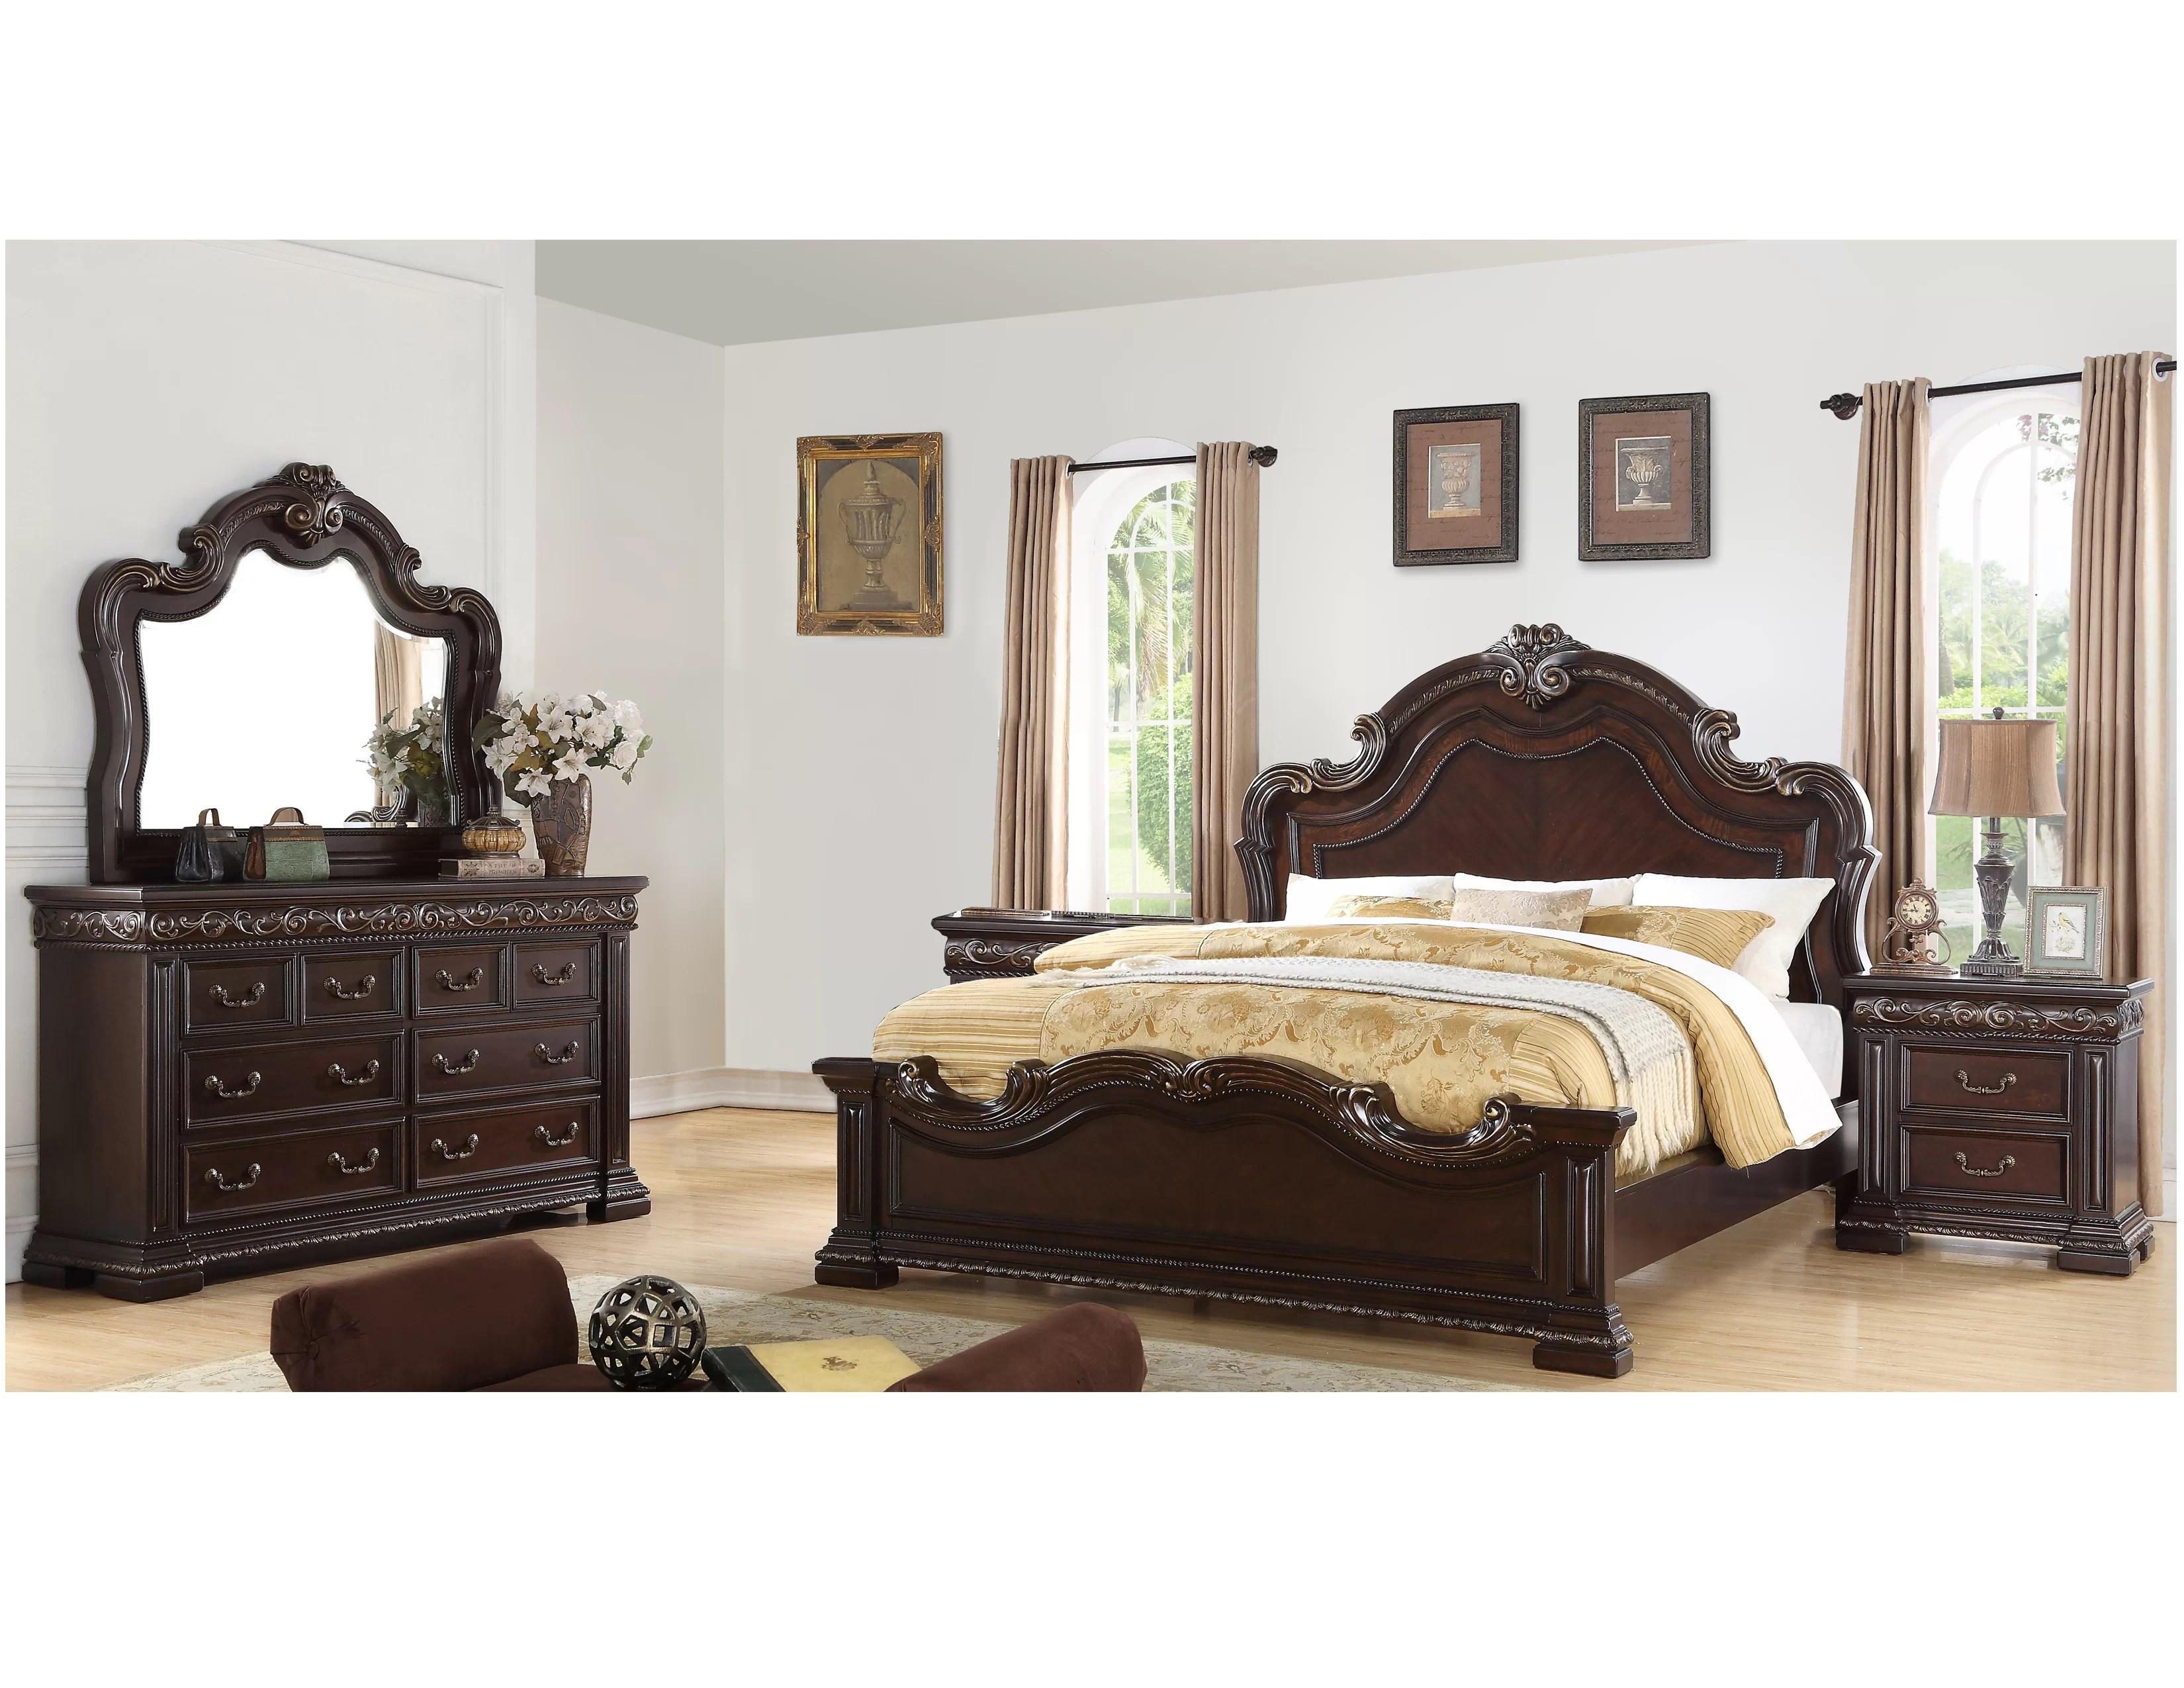 bannruod standard solid wood 5 piece bedroom set